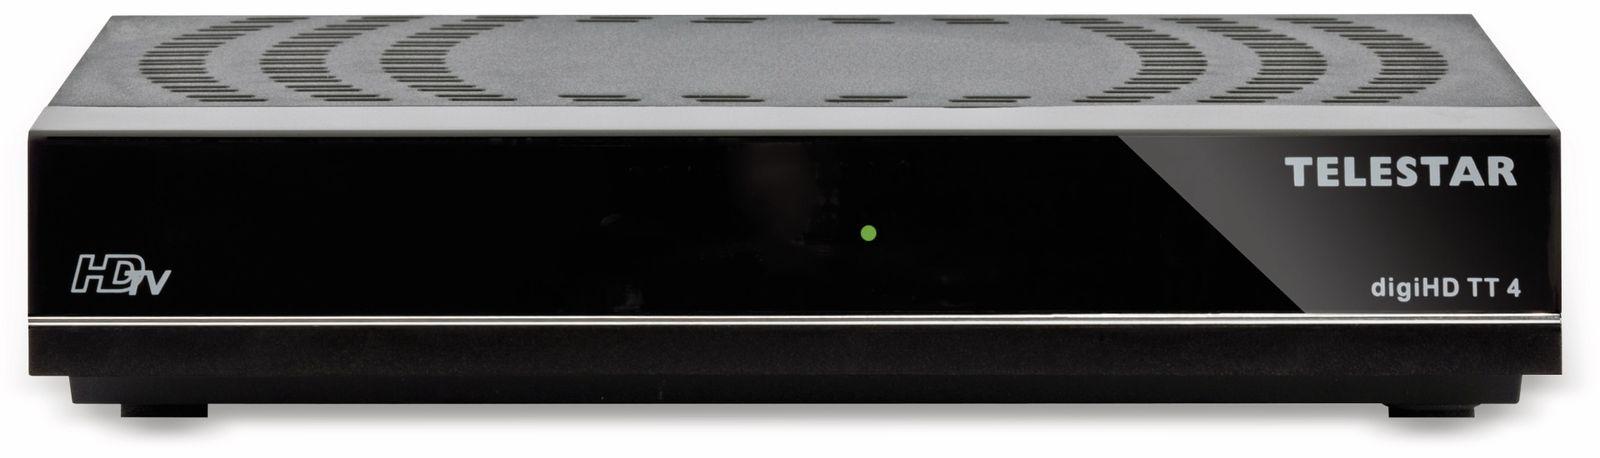 dvb t2 hdtv receiver telestar digihd tt4 online kaufen. Black Bedroom Furniture Sets. Home Design Ideas